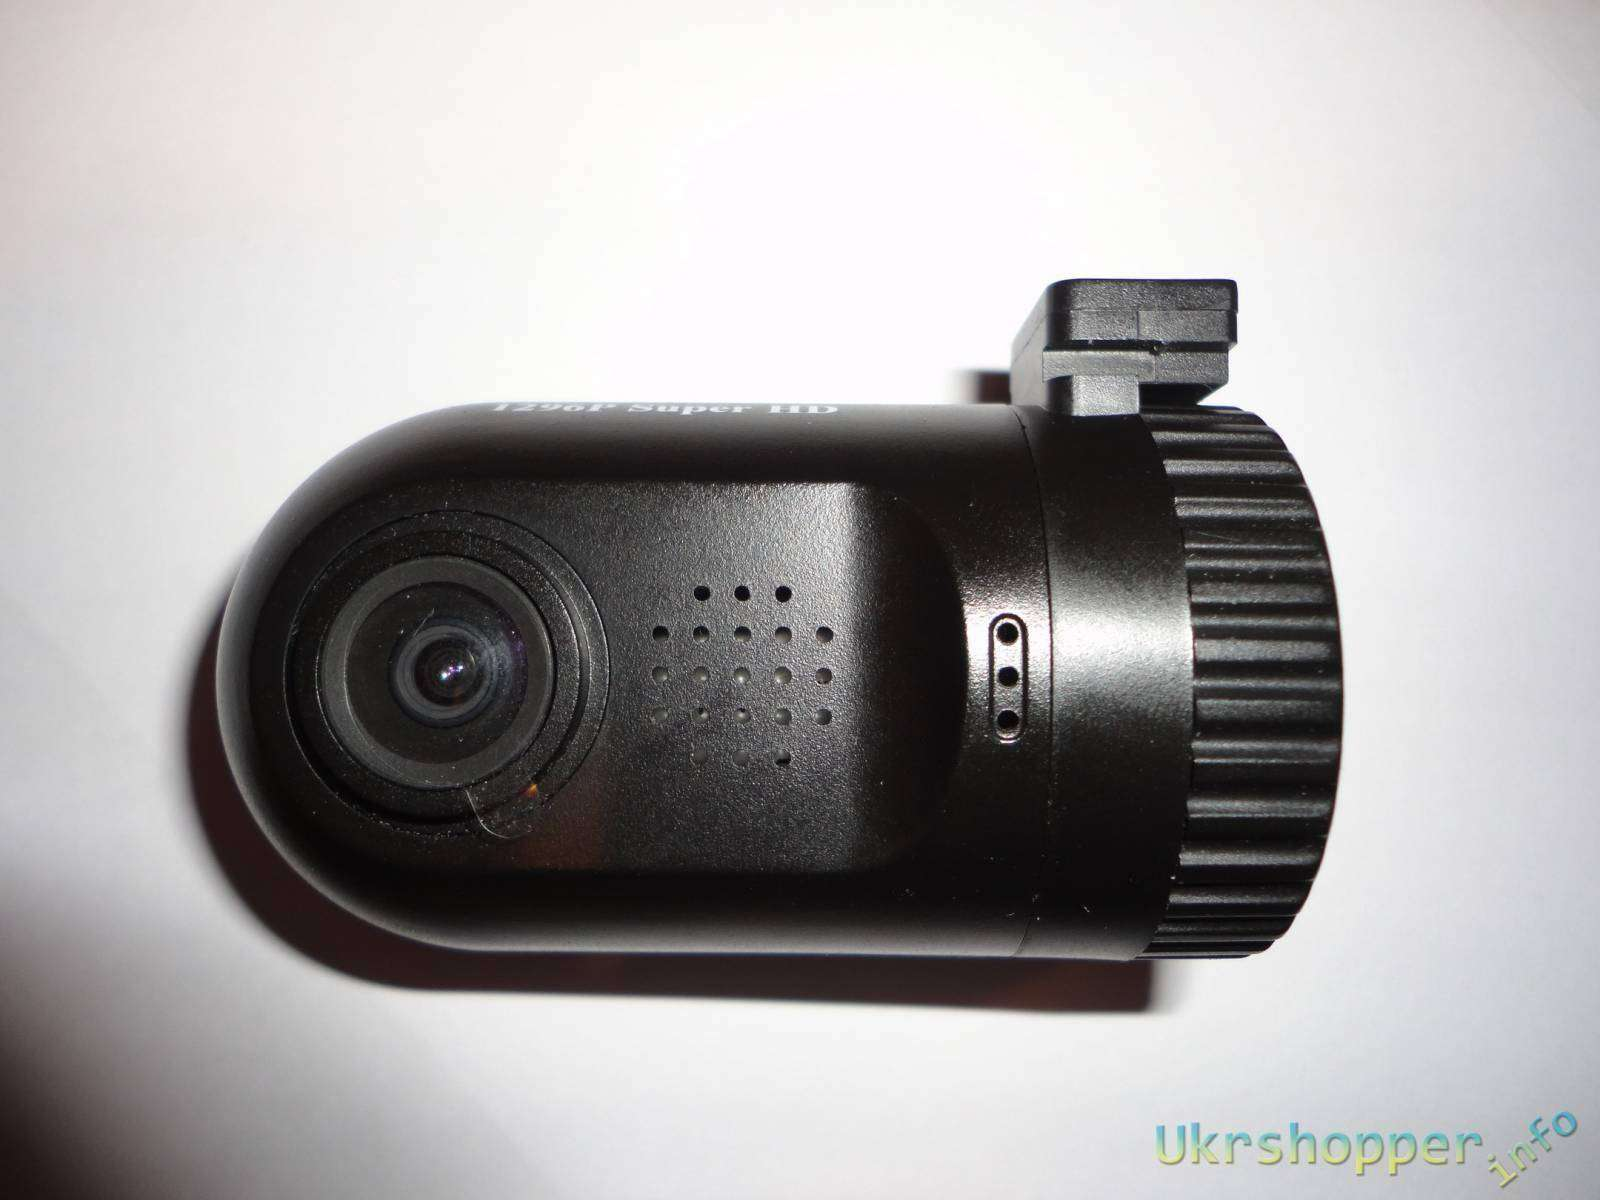 GearBest: MINI 0805 - 2K регистратор с GPS, LDWS, FCWS